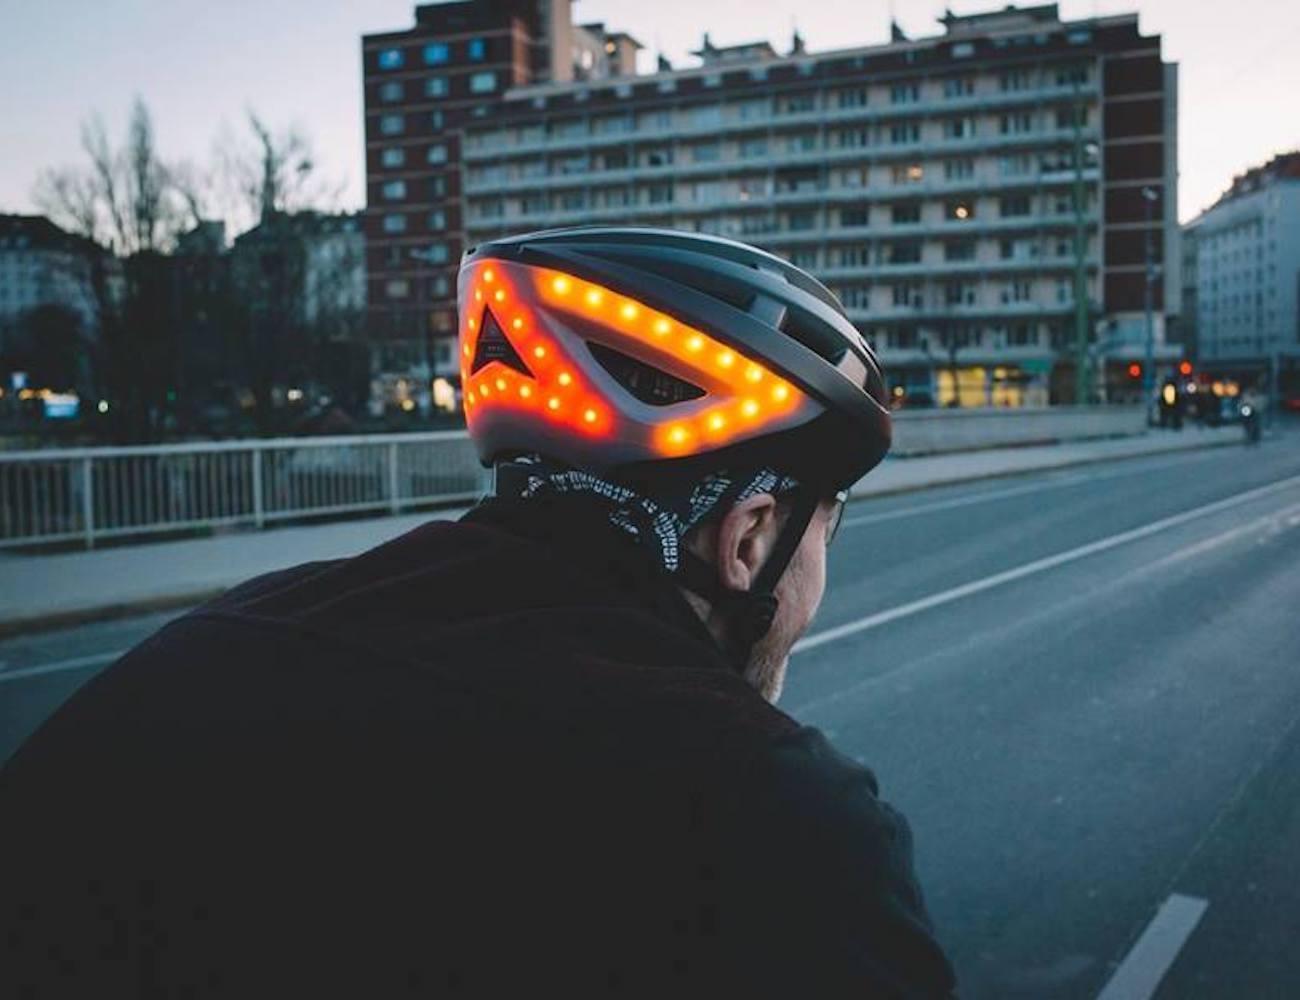 Lumos Kickstart Smart Bike Helmet keeps you visible on the road